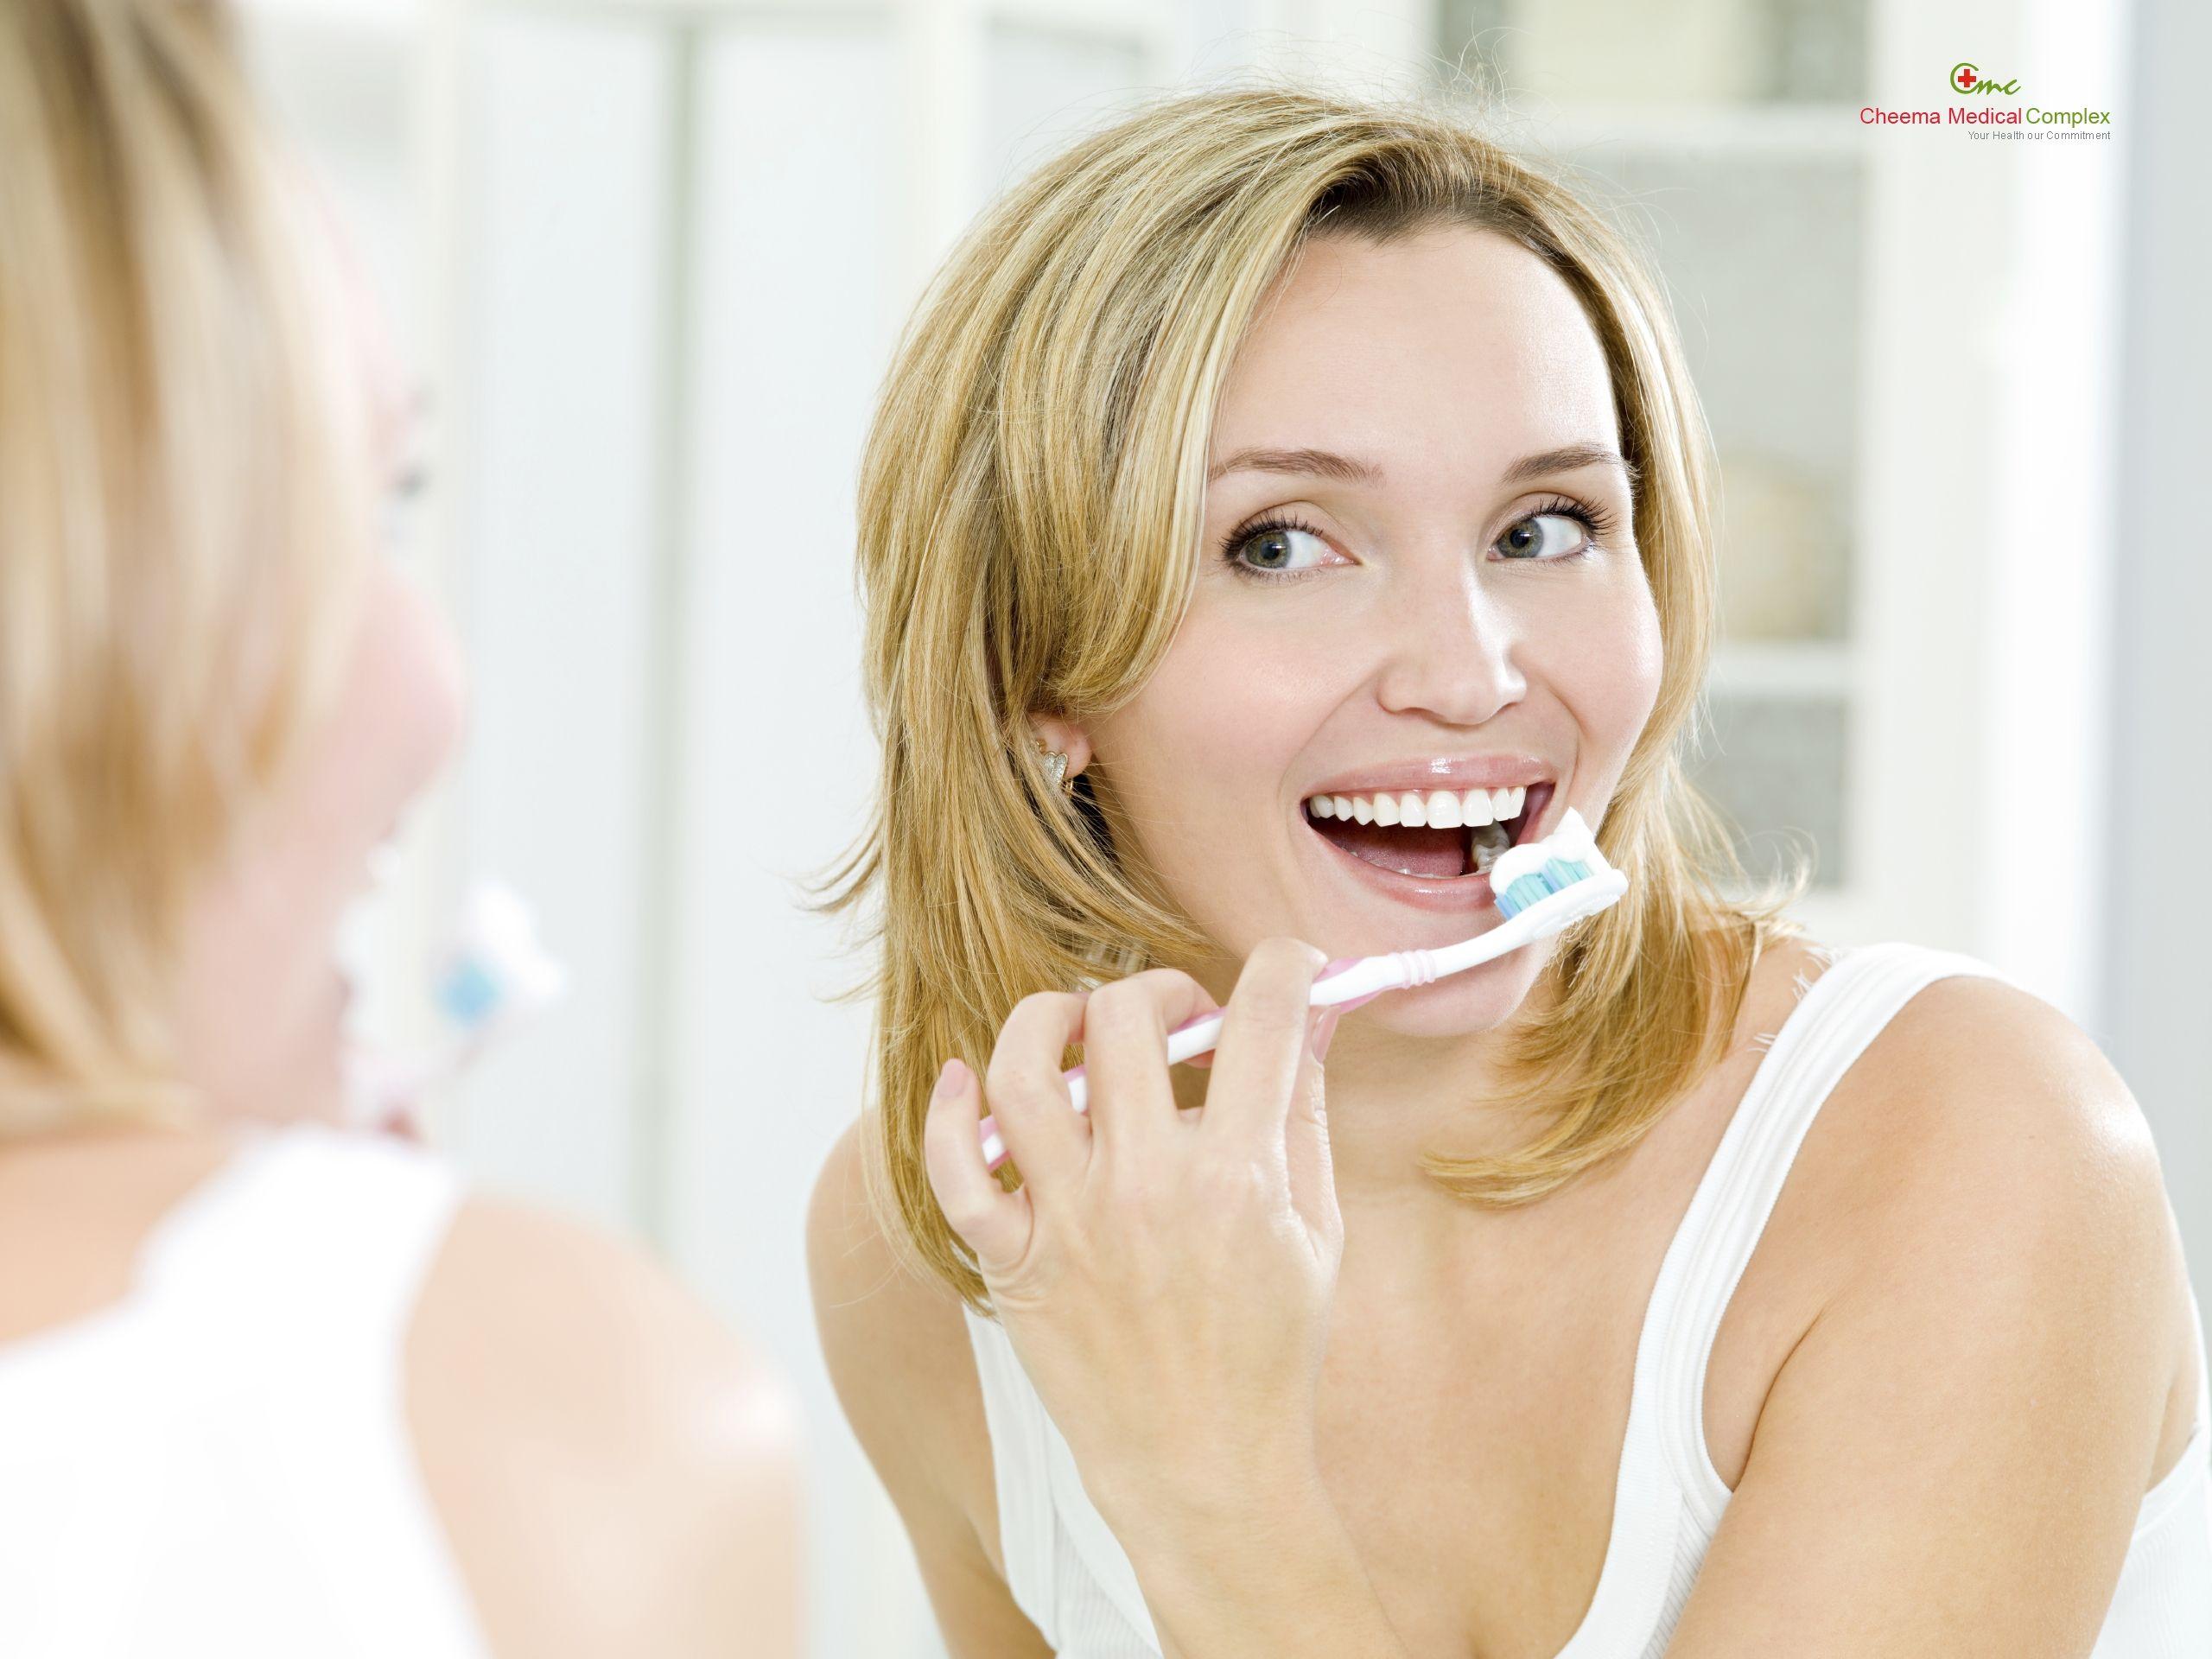 Pin by CMC Mohali Hospital on Health Dental health, Gum